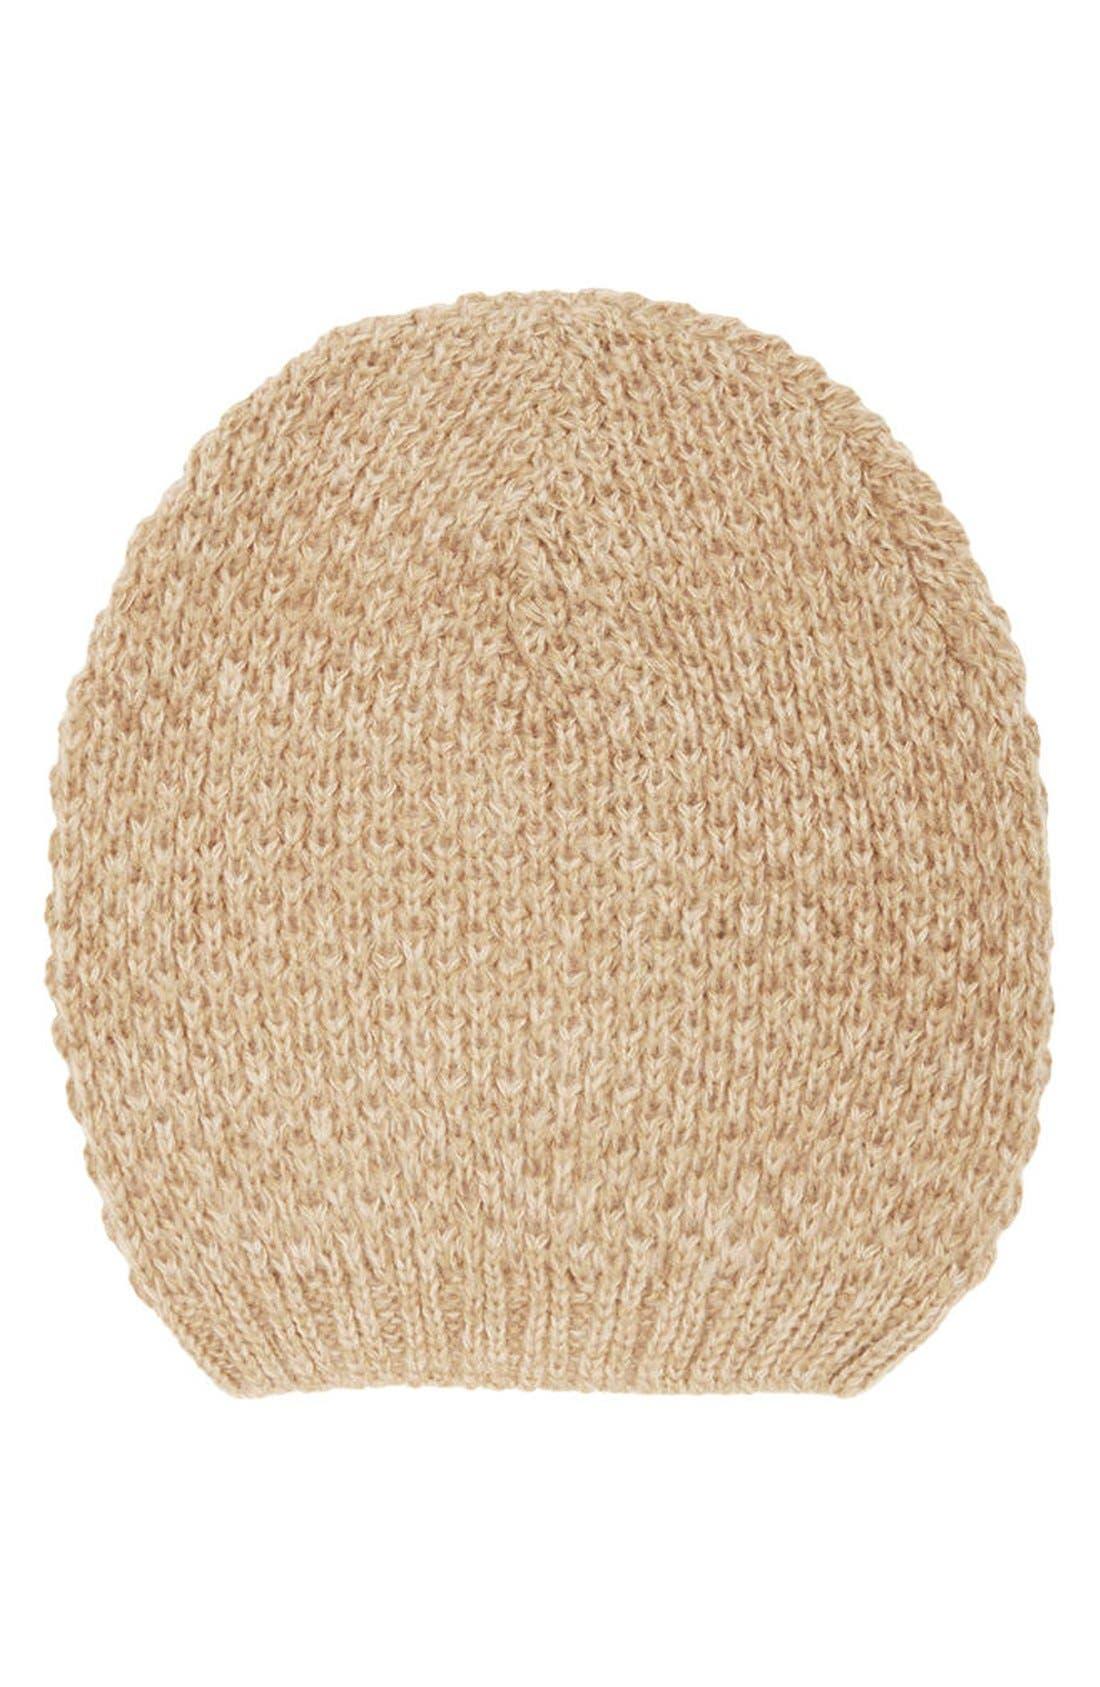 Basket Stitch Beanie,                         Main,                         color, 252